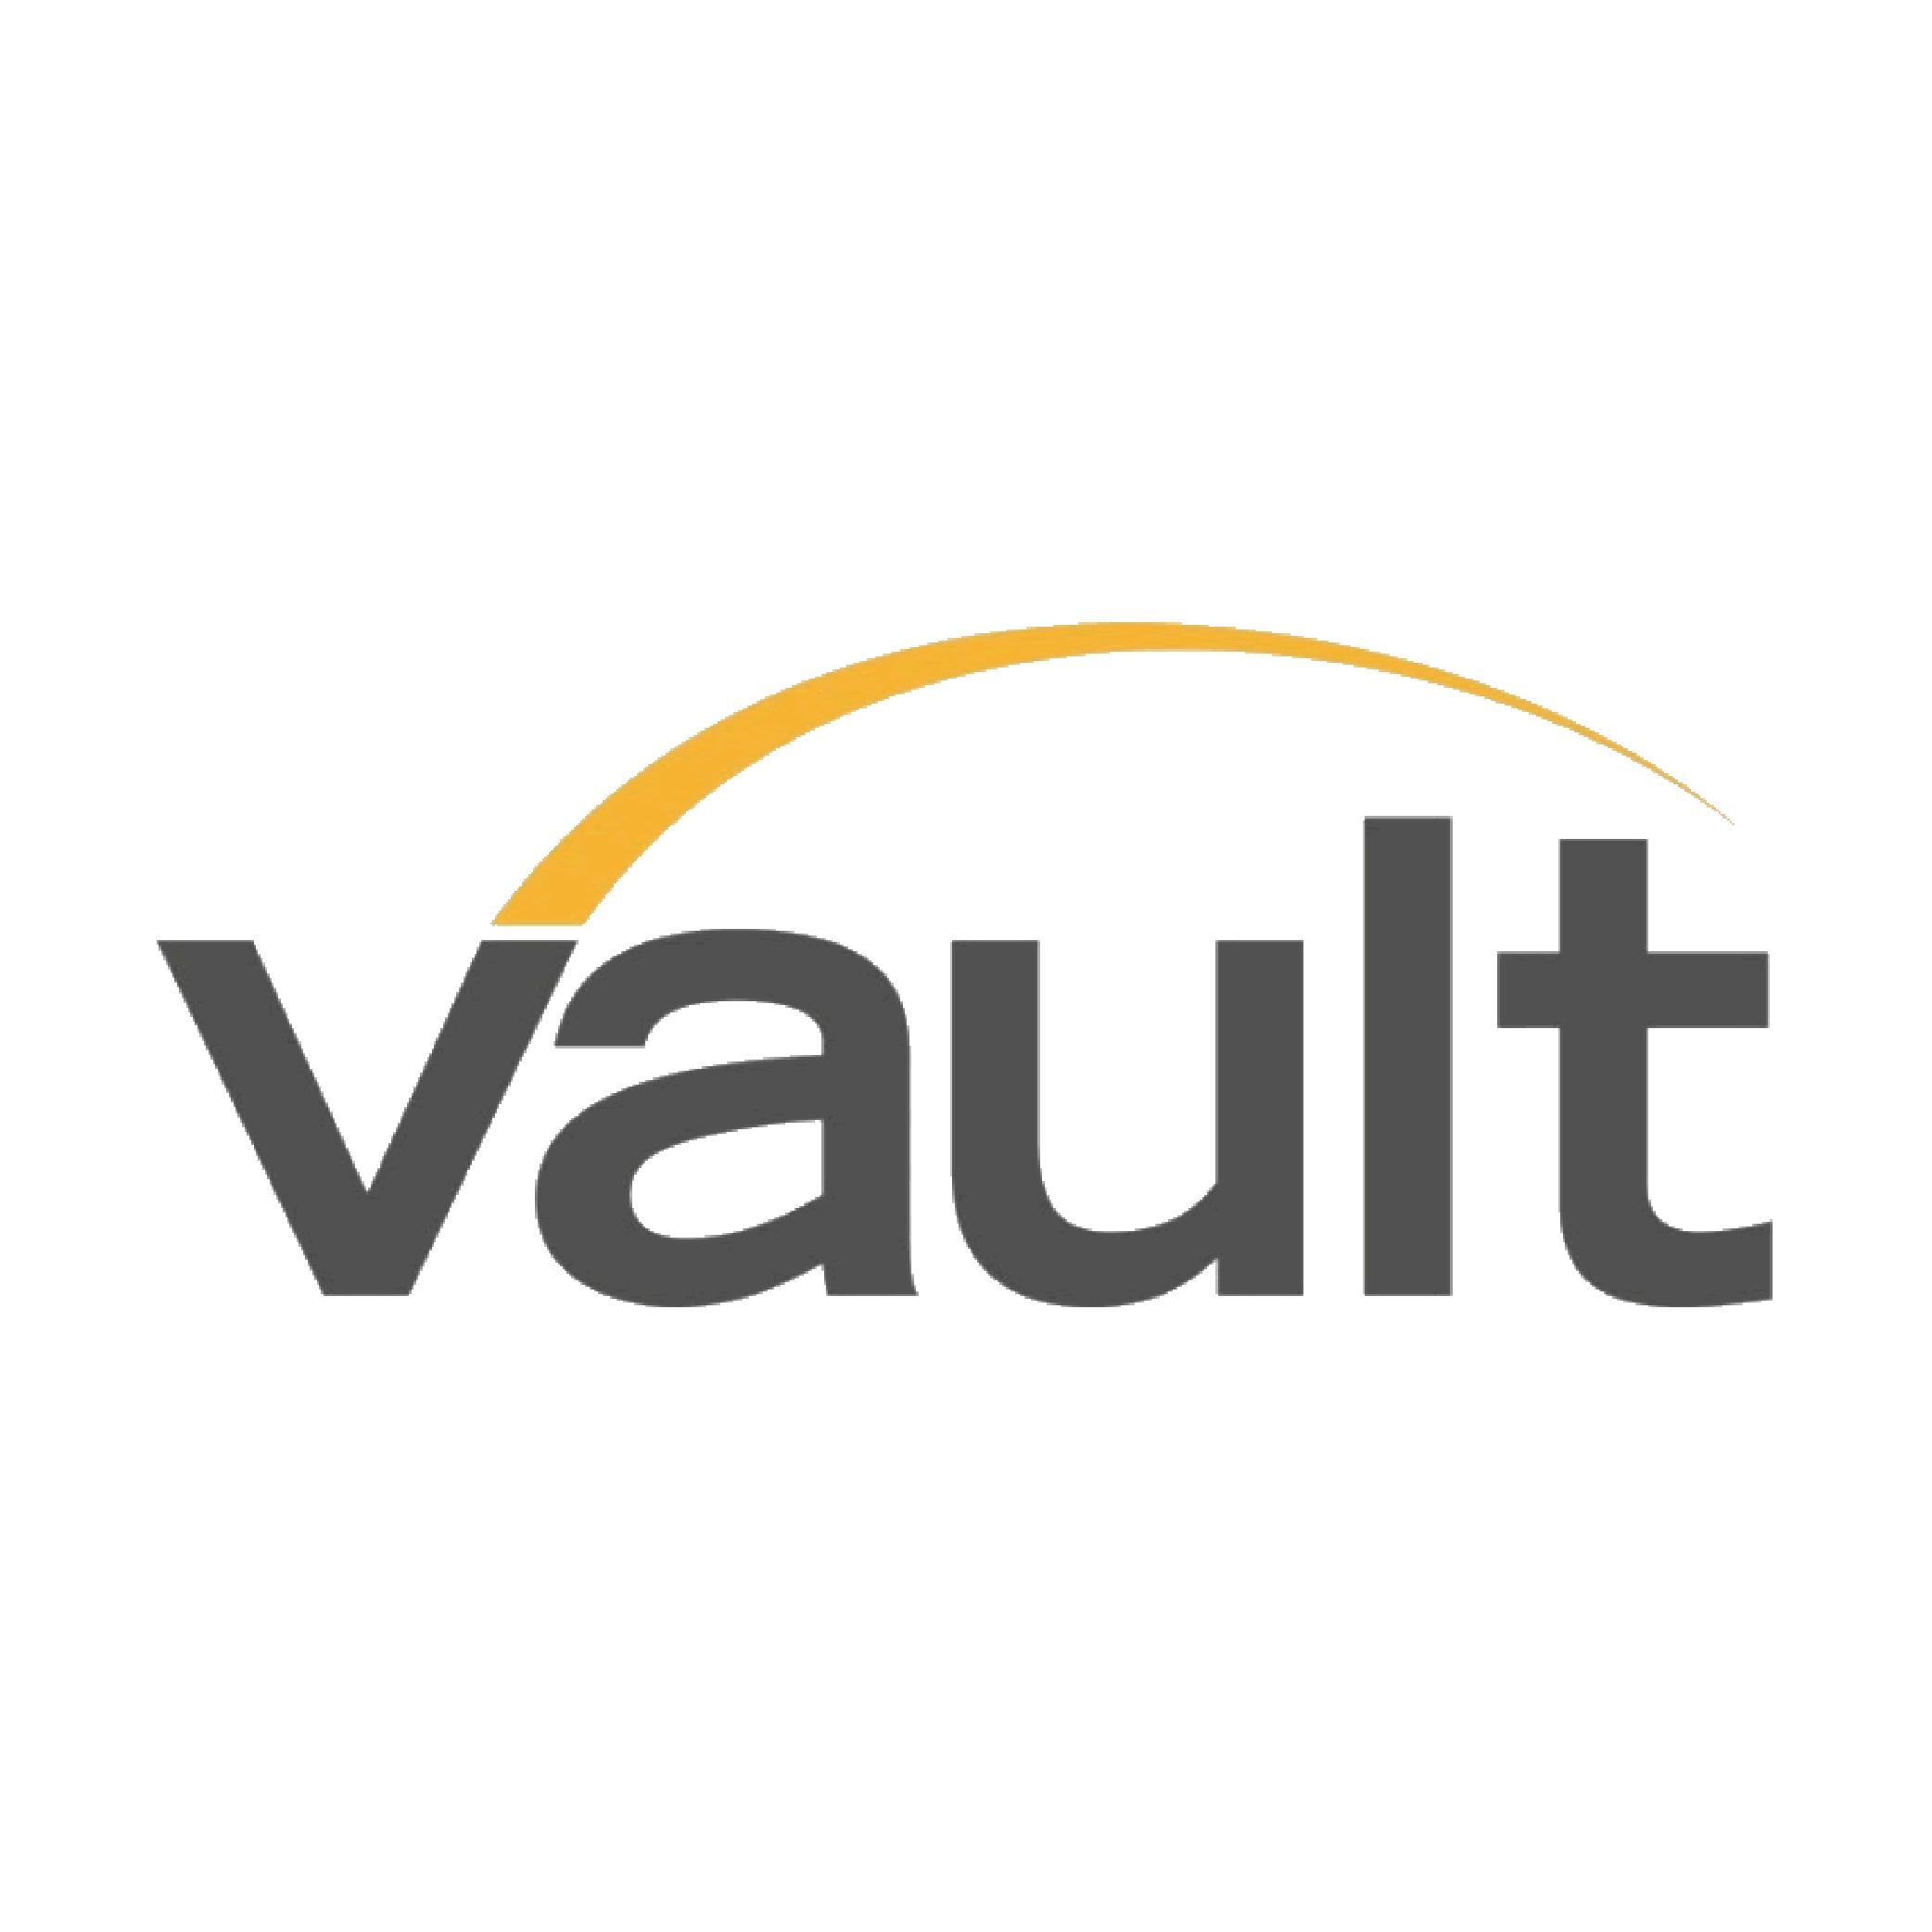 Vault Logo Resized-01.png